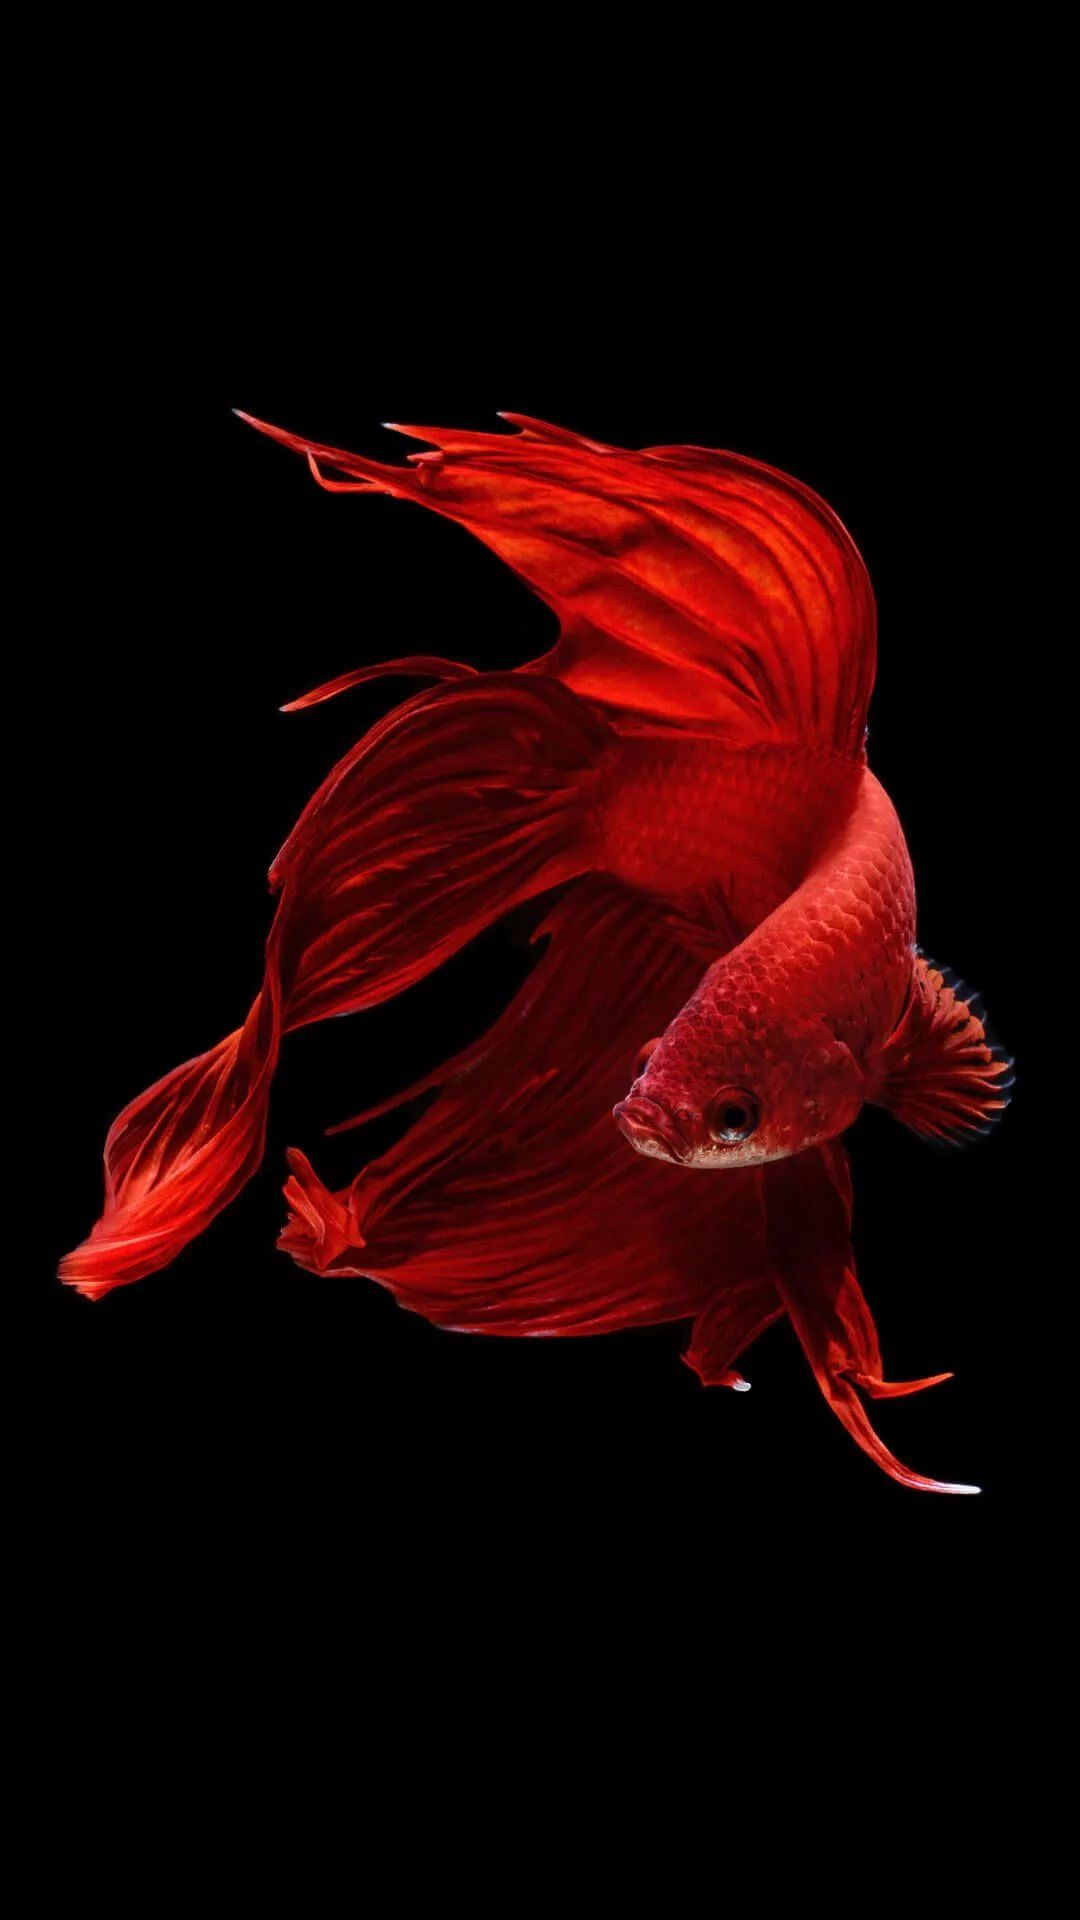 Fish iPhone home screen wallpaper